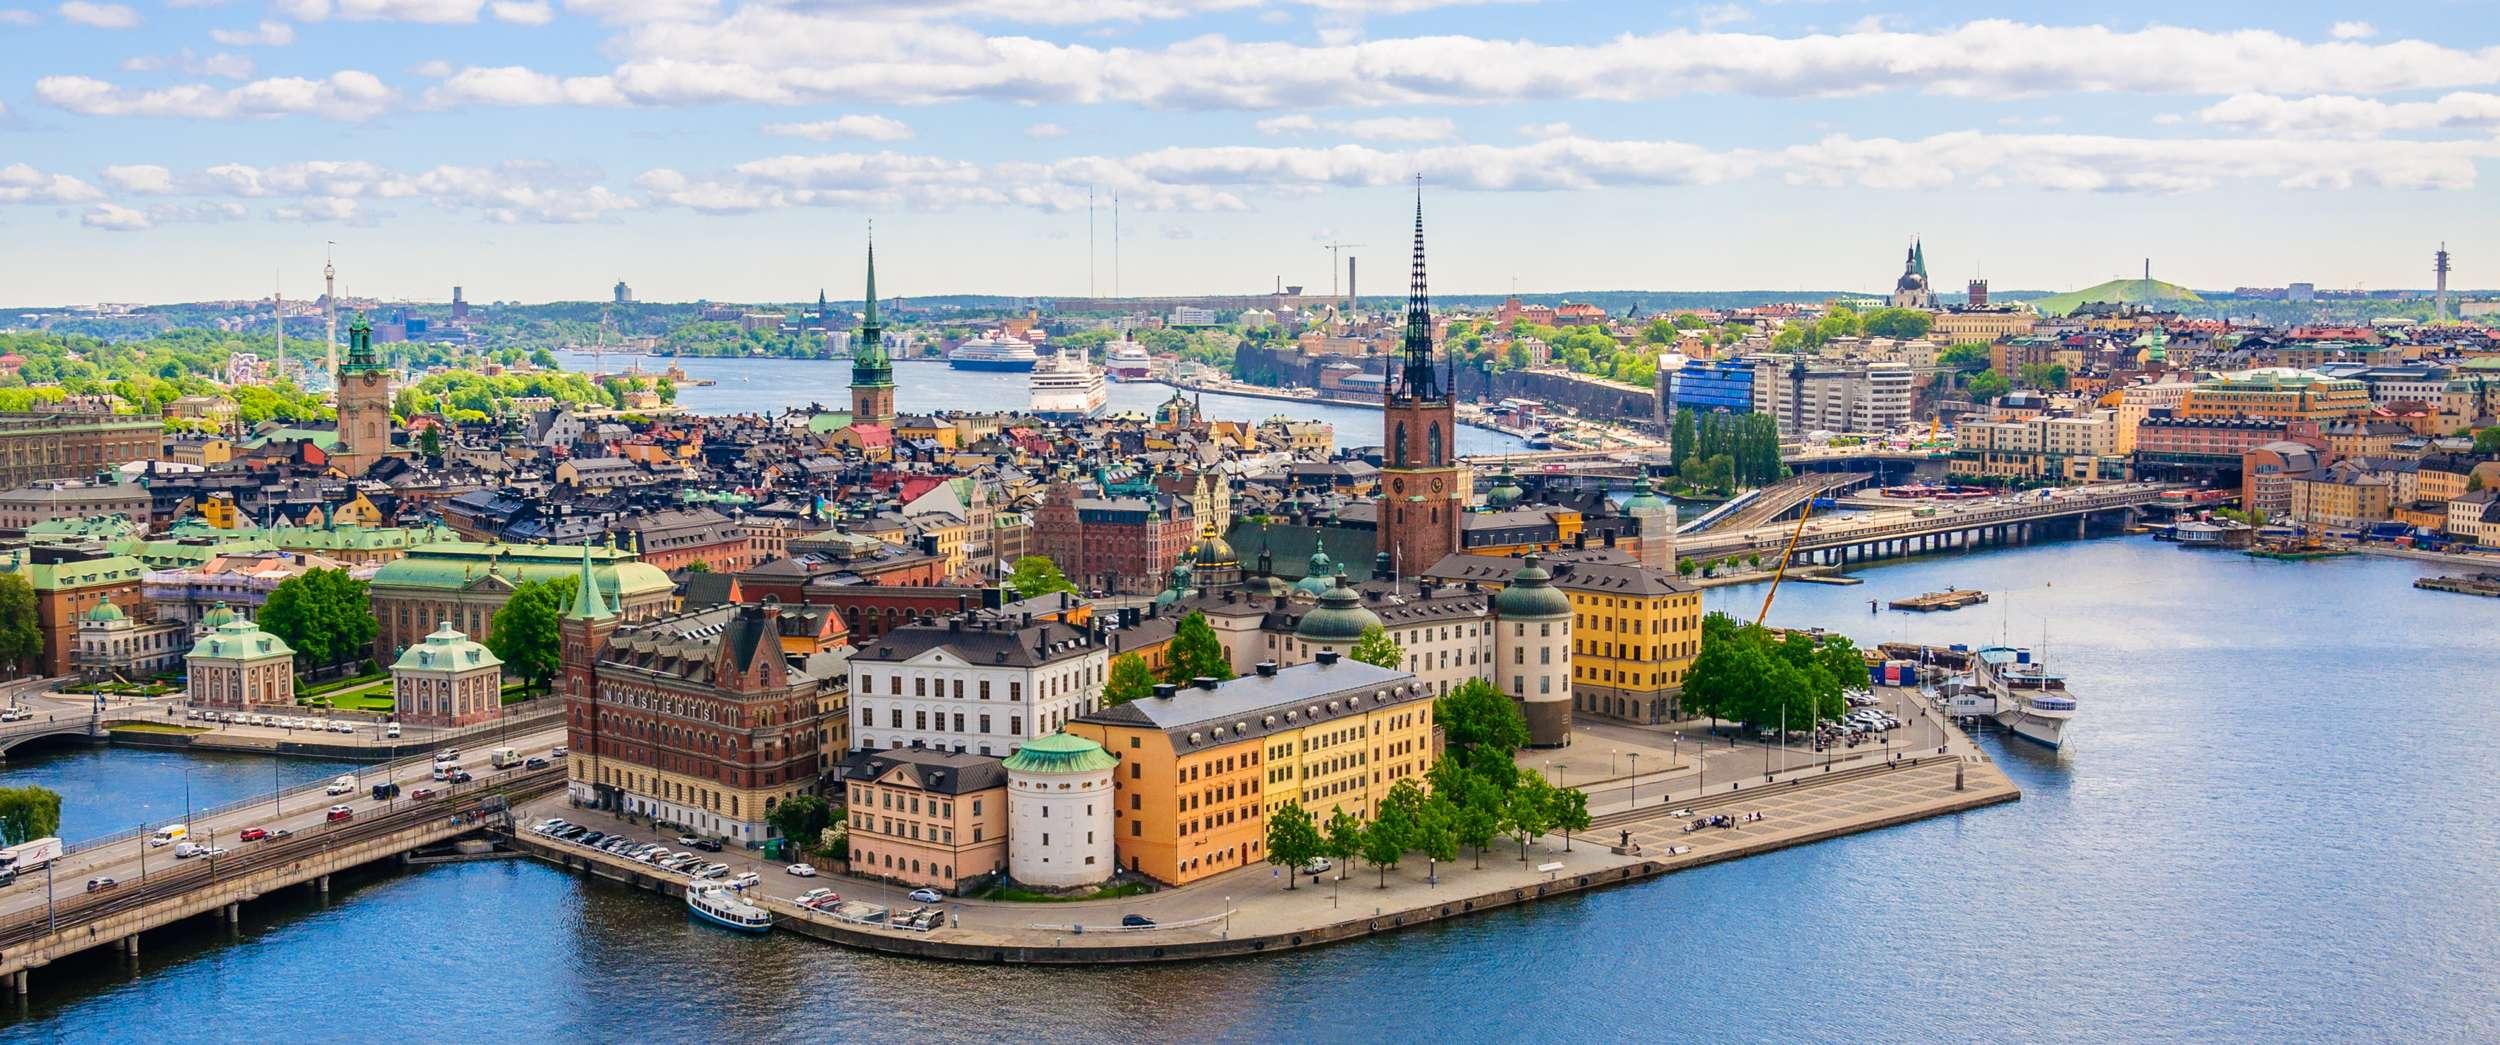 shu-Europe-Sweden-Stockholm-613199033-Andrey-Shcherbukhin-2500x1045.jpg